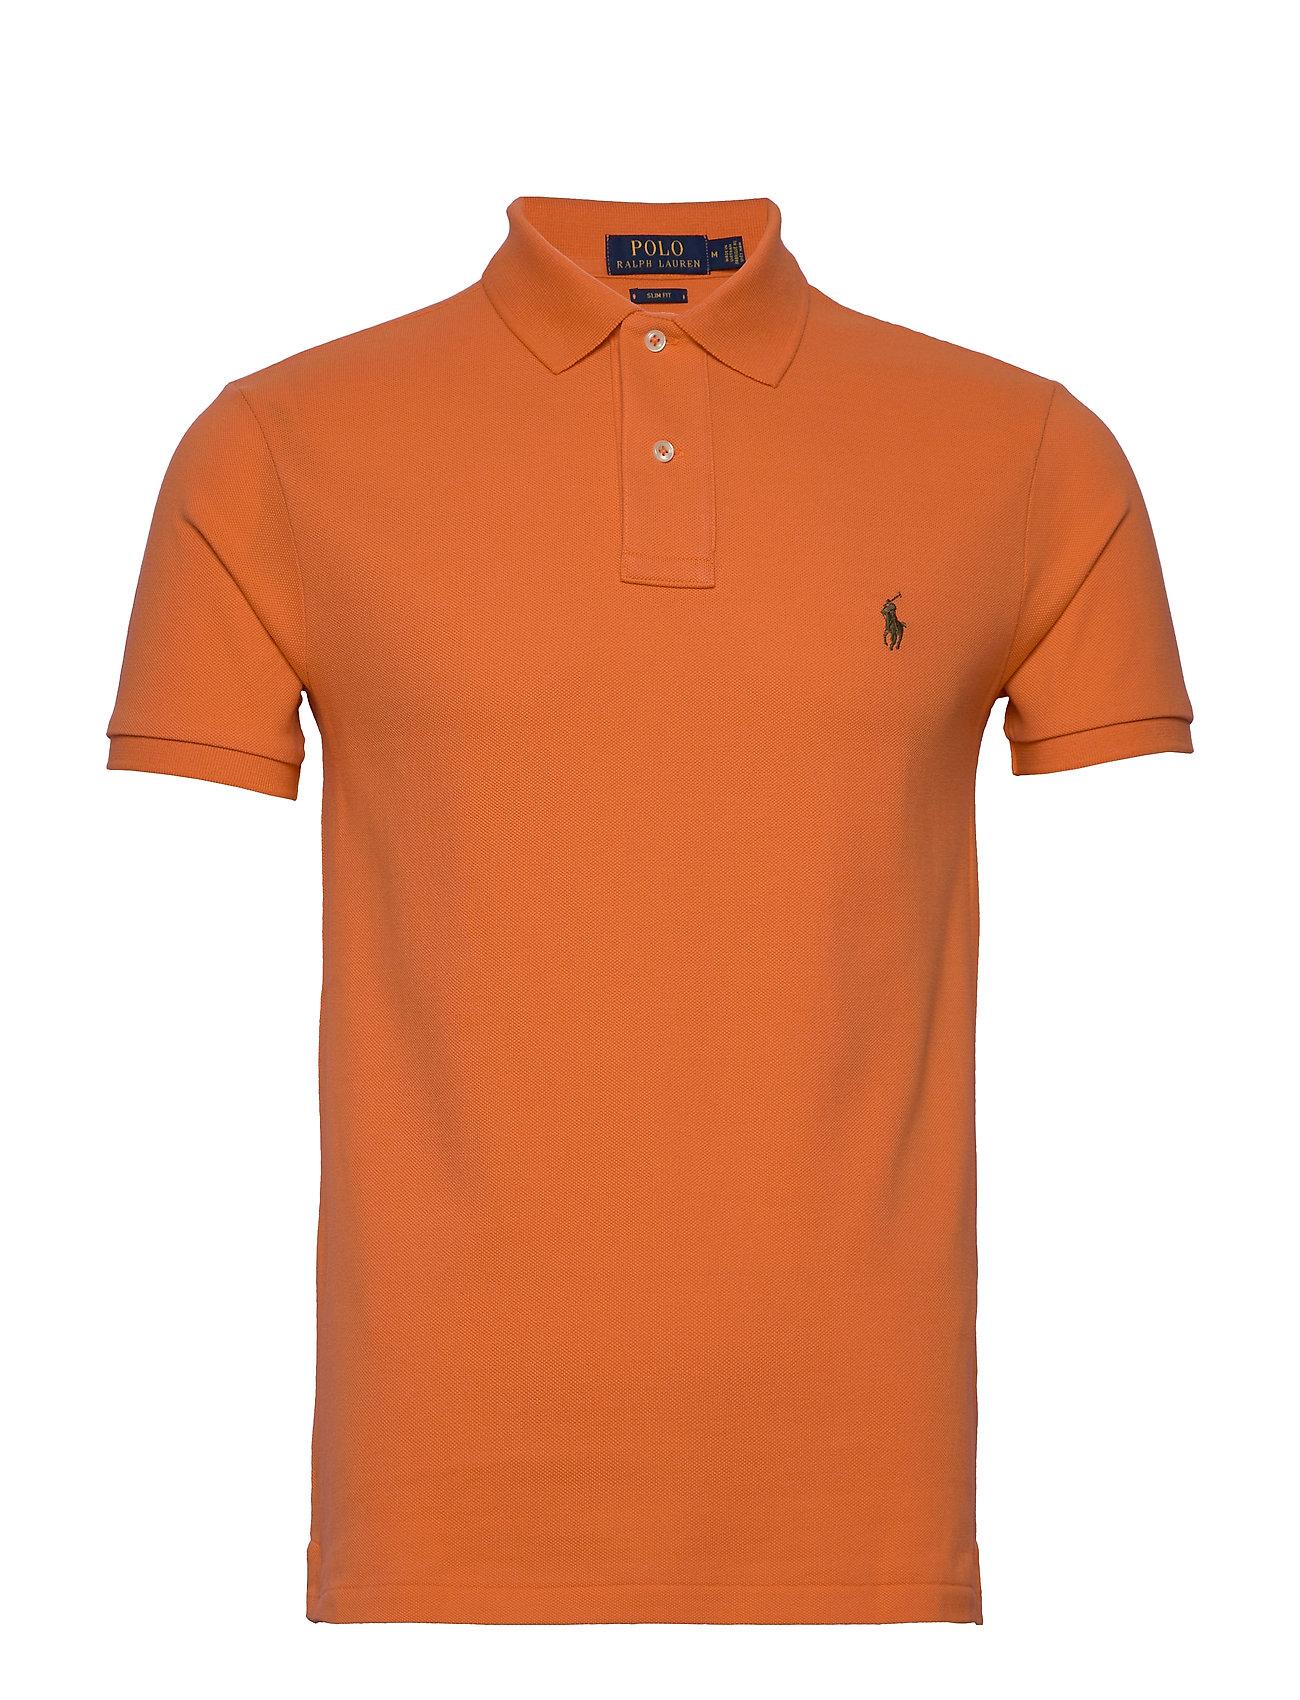 Polo Ralph Lauren Slim Fit Mesh Polo Shirt - SOUTHERN ORANGE/C